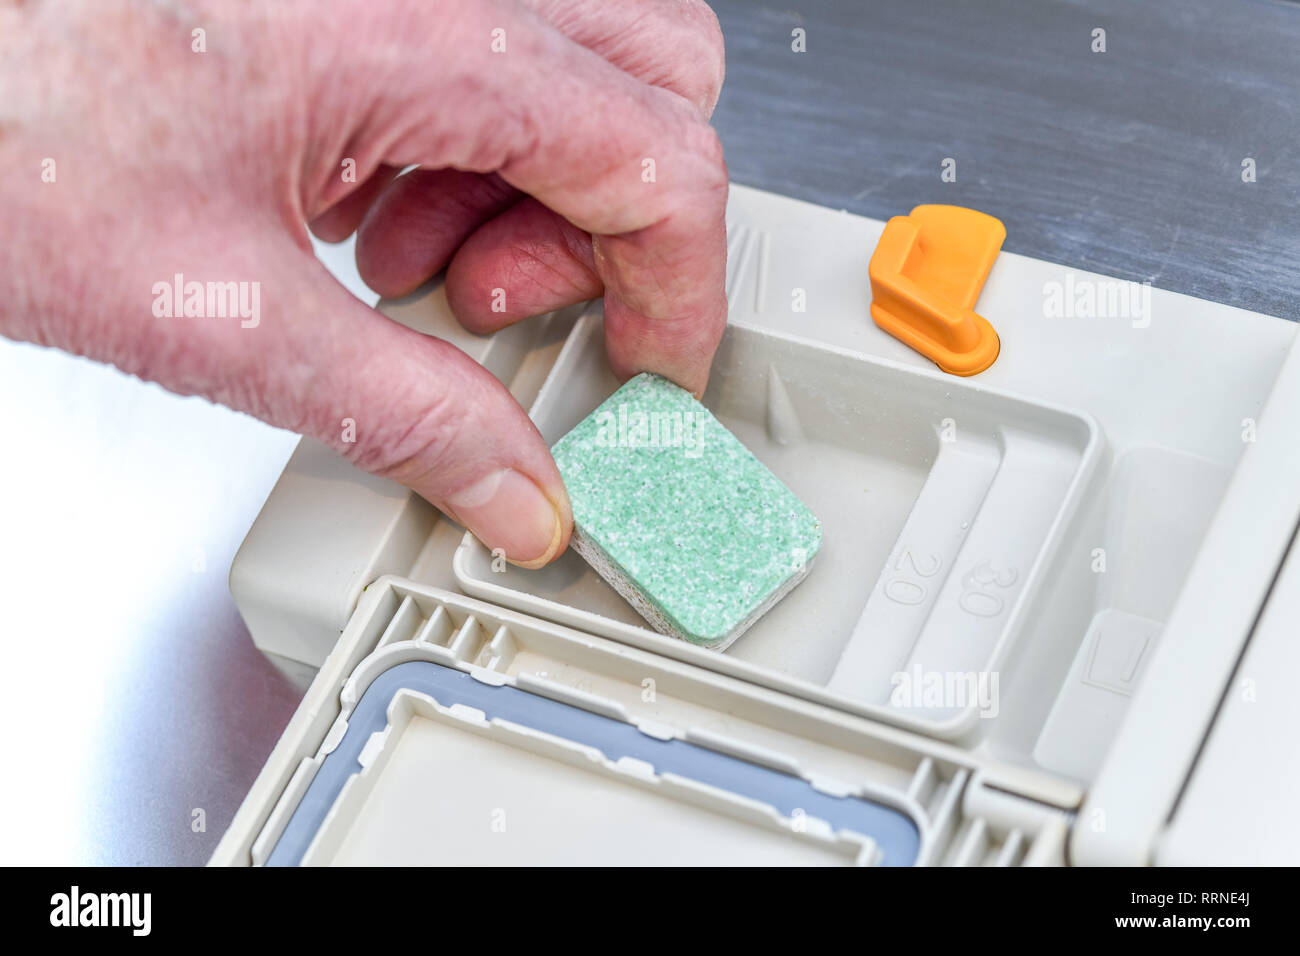 Tab., dishwasher, Tab, Geschirrspülmaschine Stock Photo